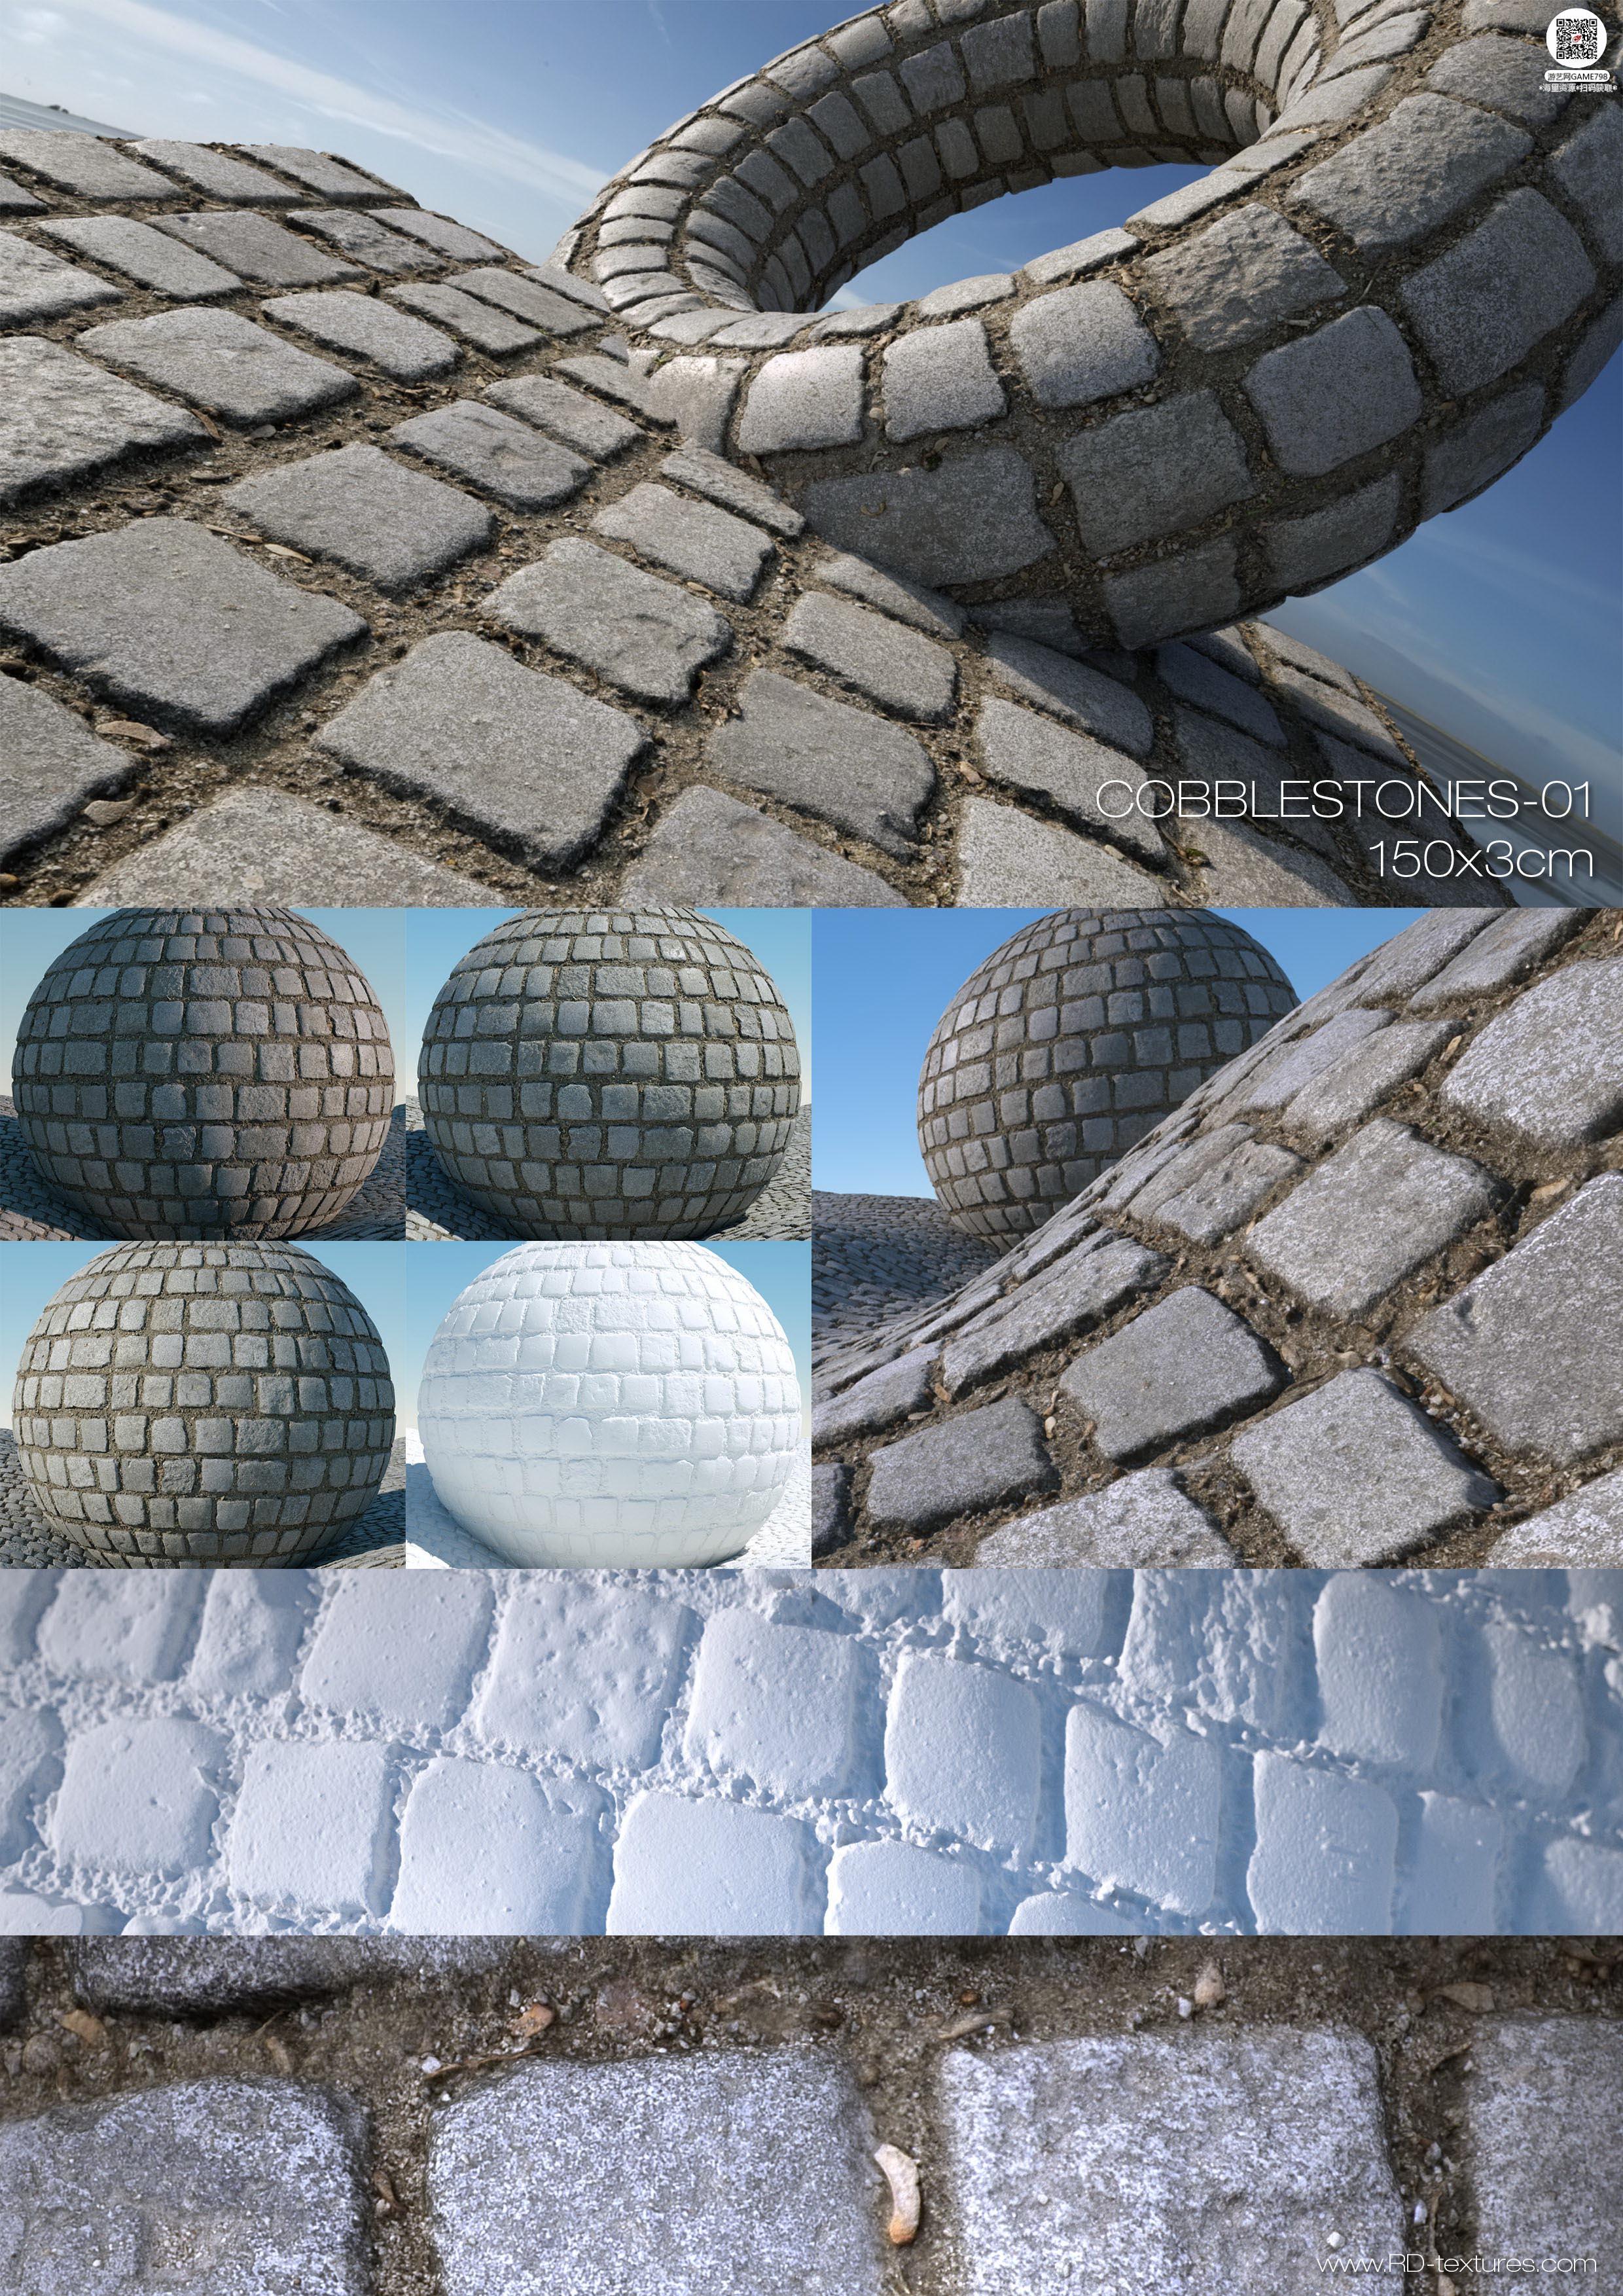 COBBLESTONES-01_150x3cm.jpg